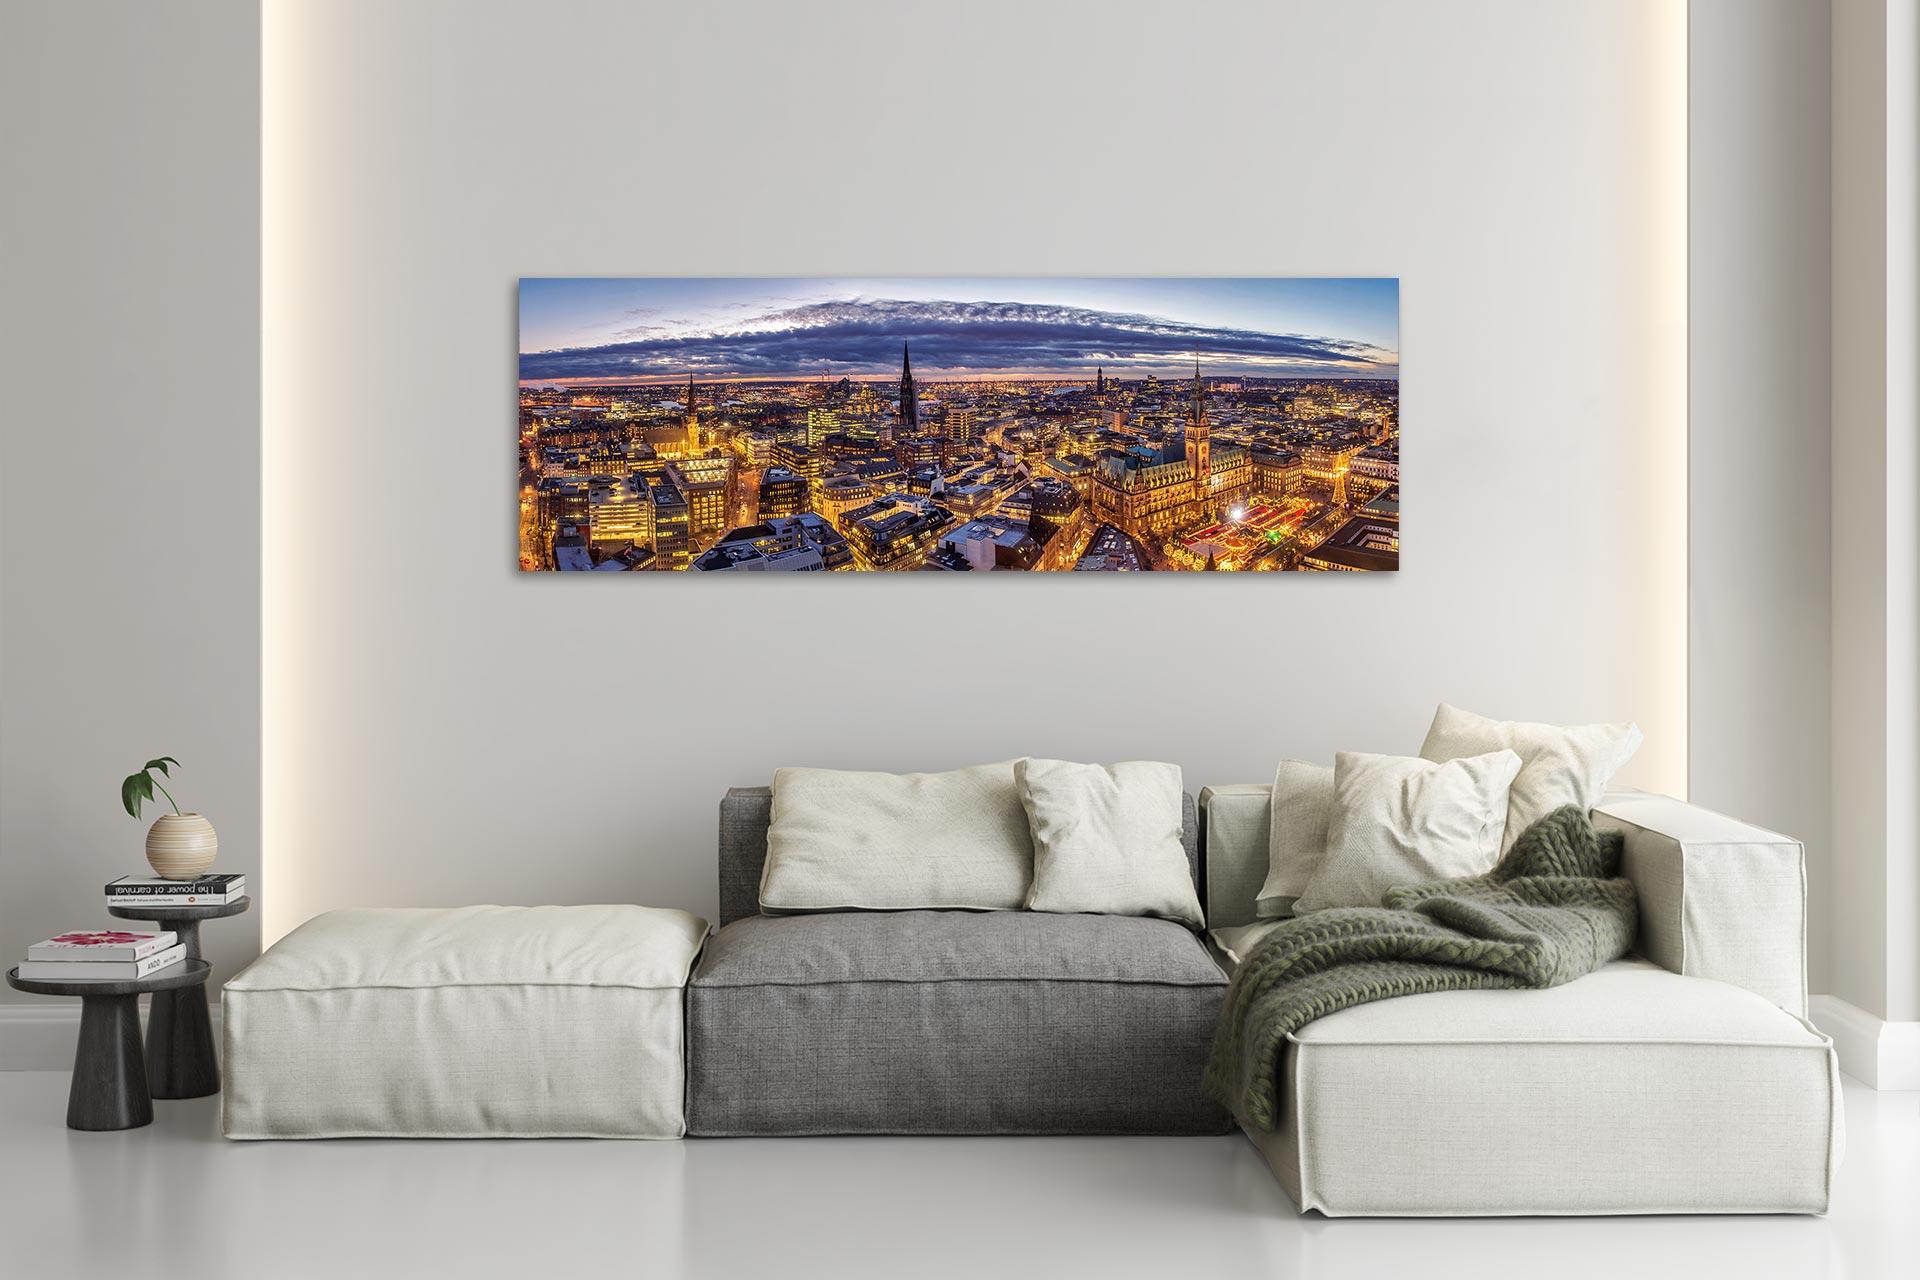 PSW023-panorama-hamburg-wandbild-leinwand-acrylglas-aludibond-wohnzimmer